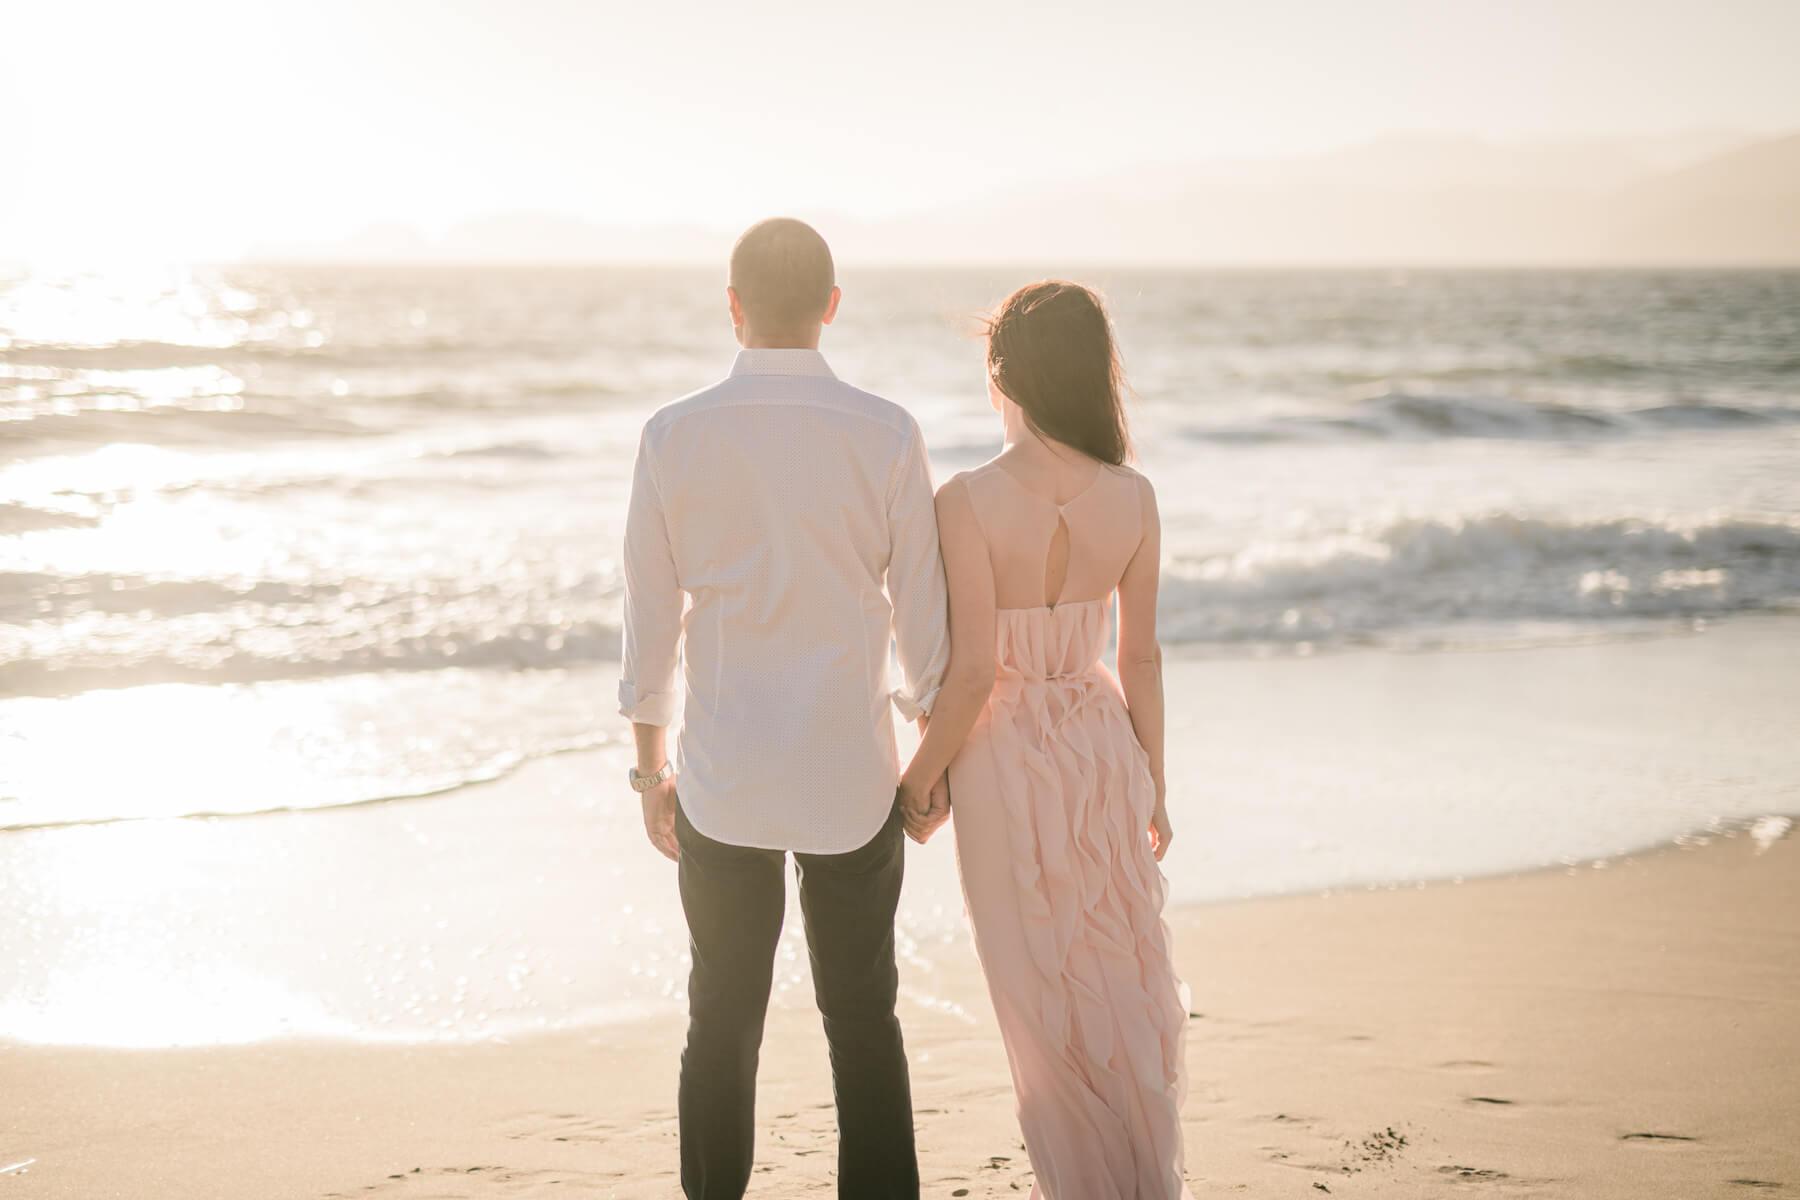 san-francisco-07-12-2020-couples-trip-54_original